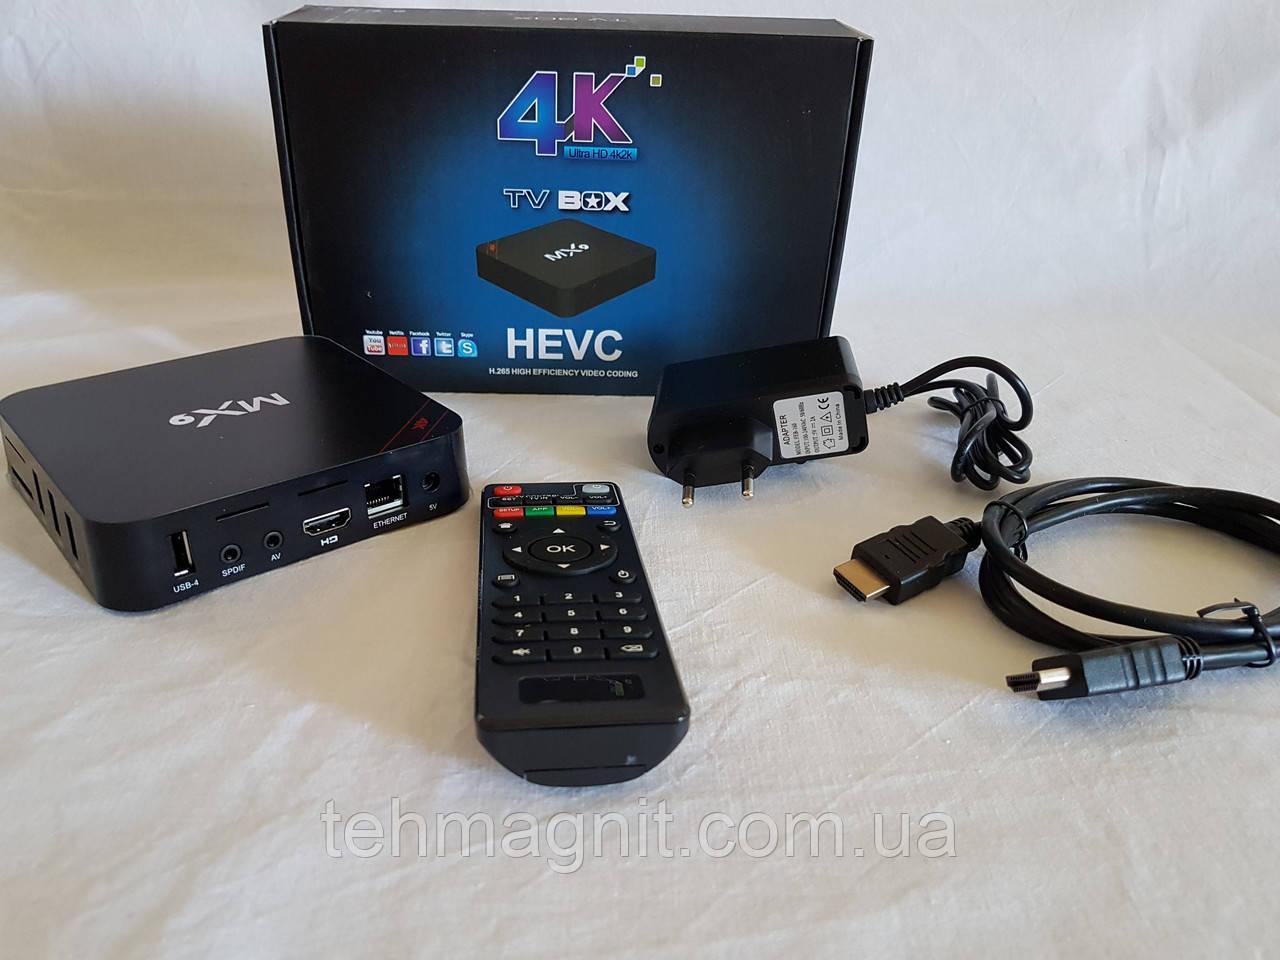 СМАРТ ПРИСТАВКИ ДЛЯ ТБ MX9 Smart TV Box Android Приставка смарт ТВ